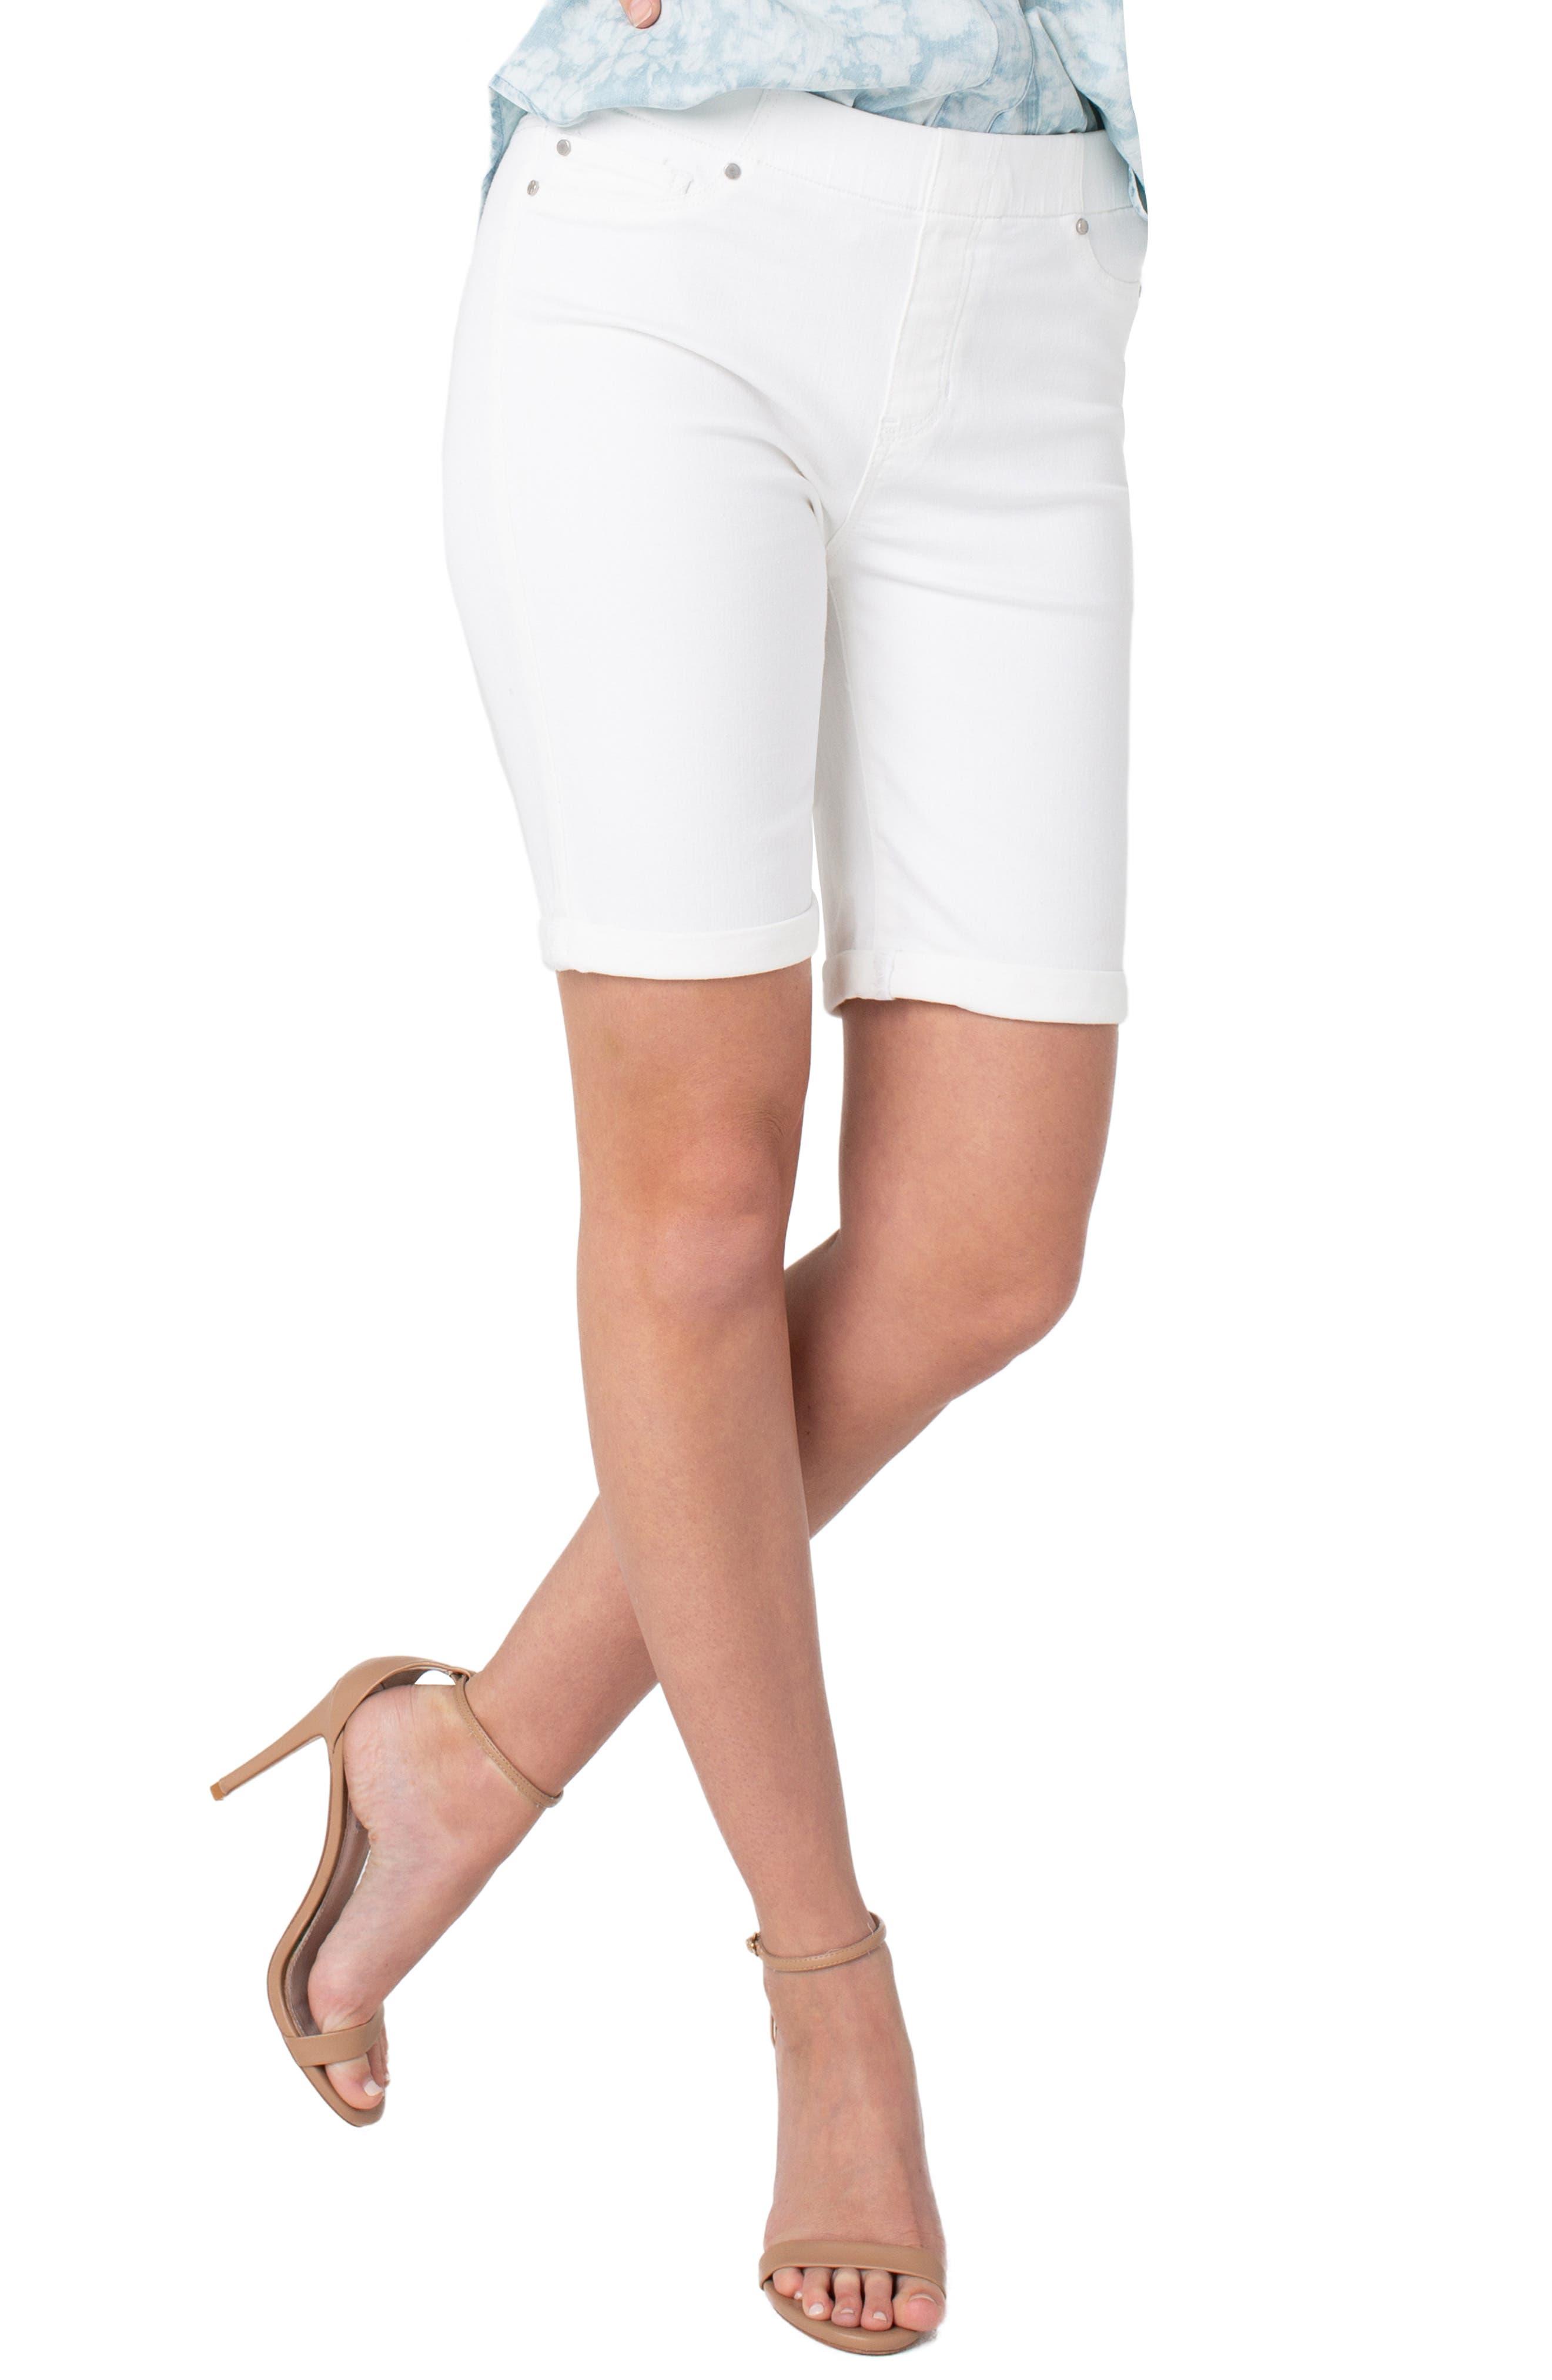 Chloe Pull-On Bermuda Shorts